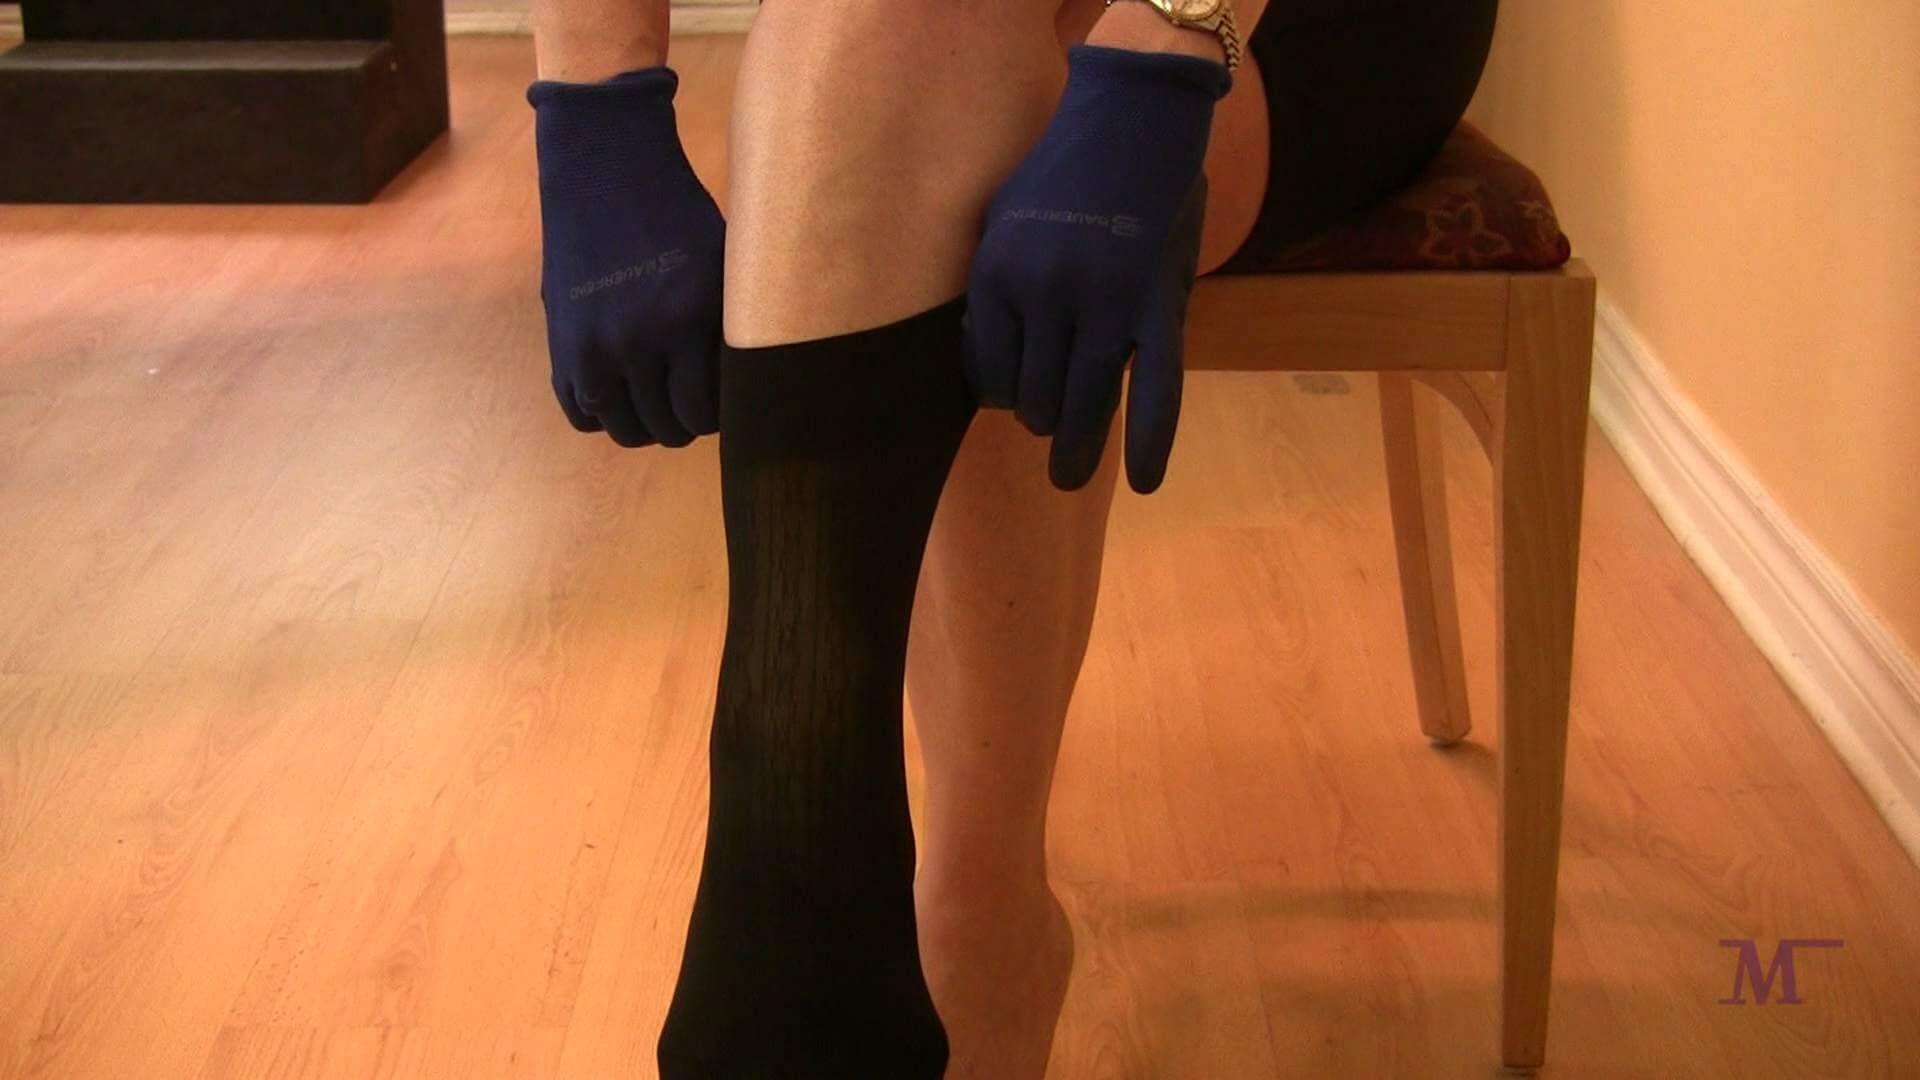 Best Ankle Brace for Arthritis Reviews